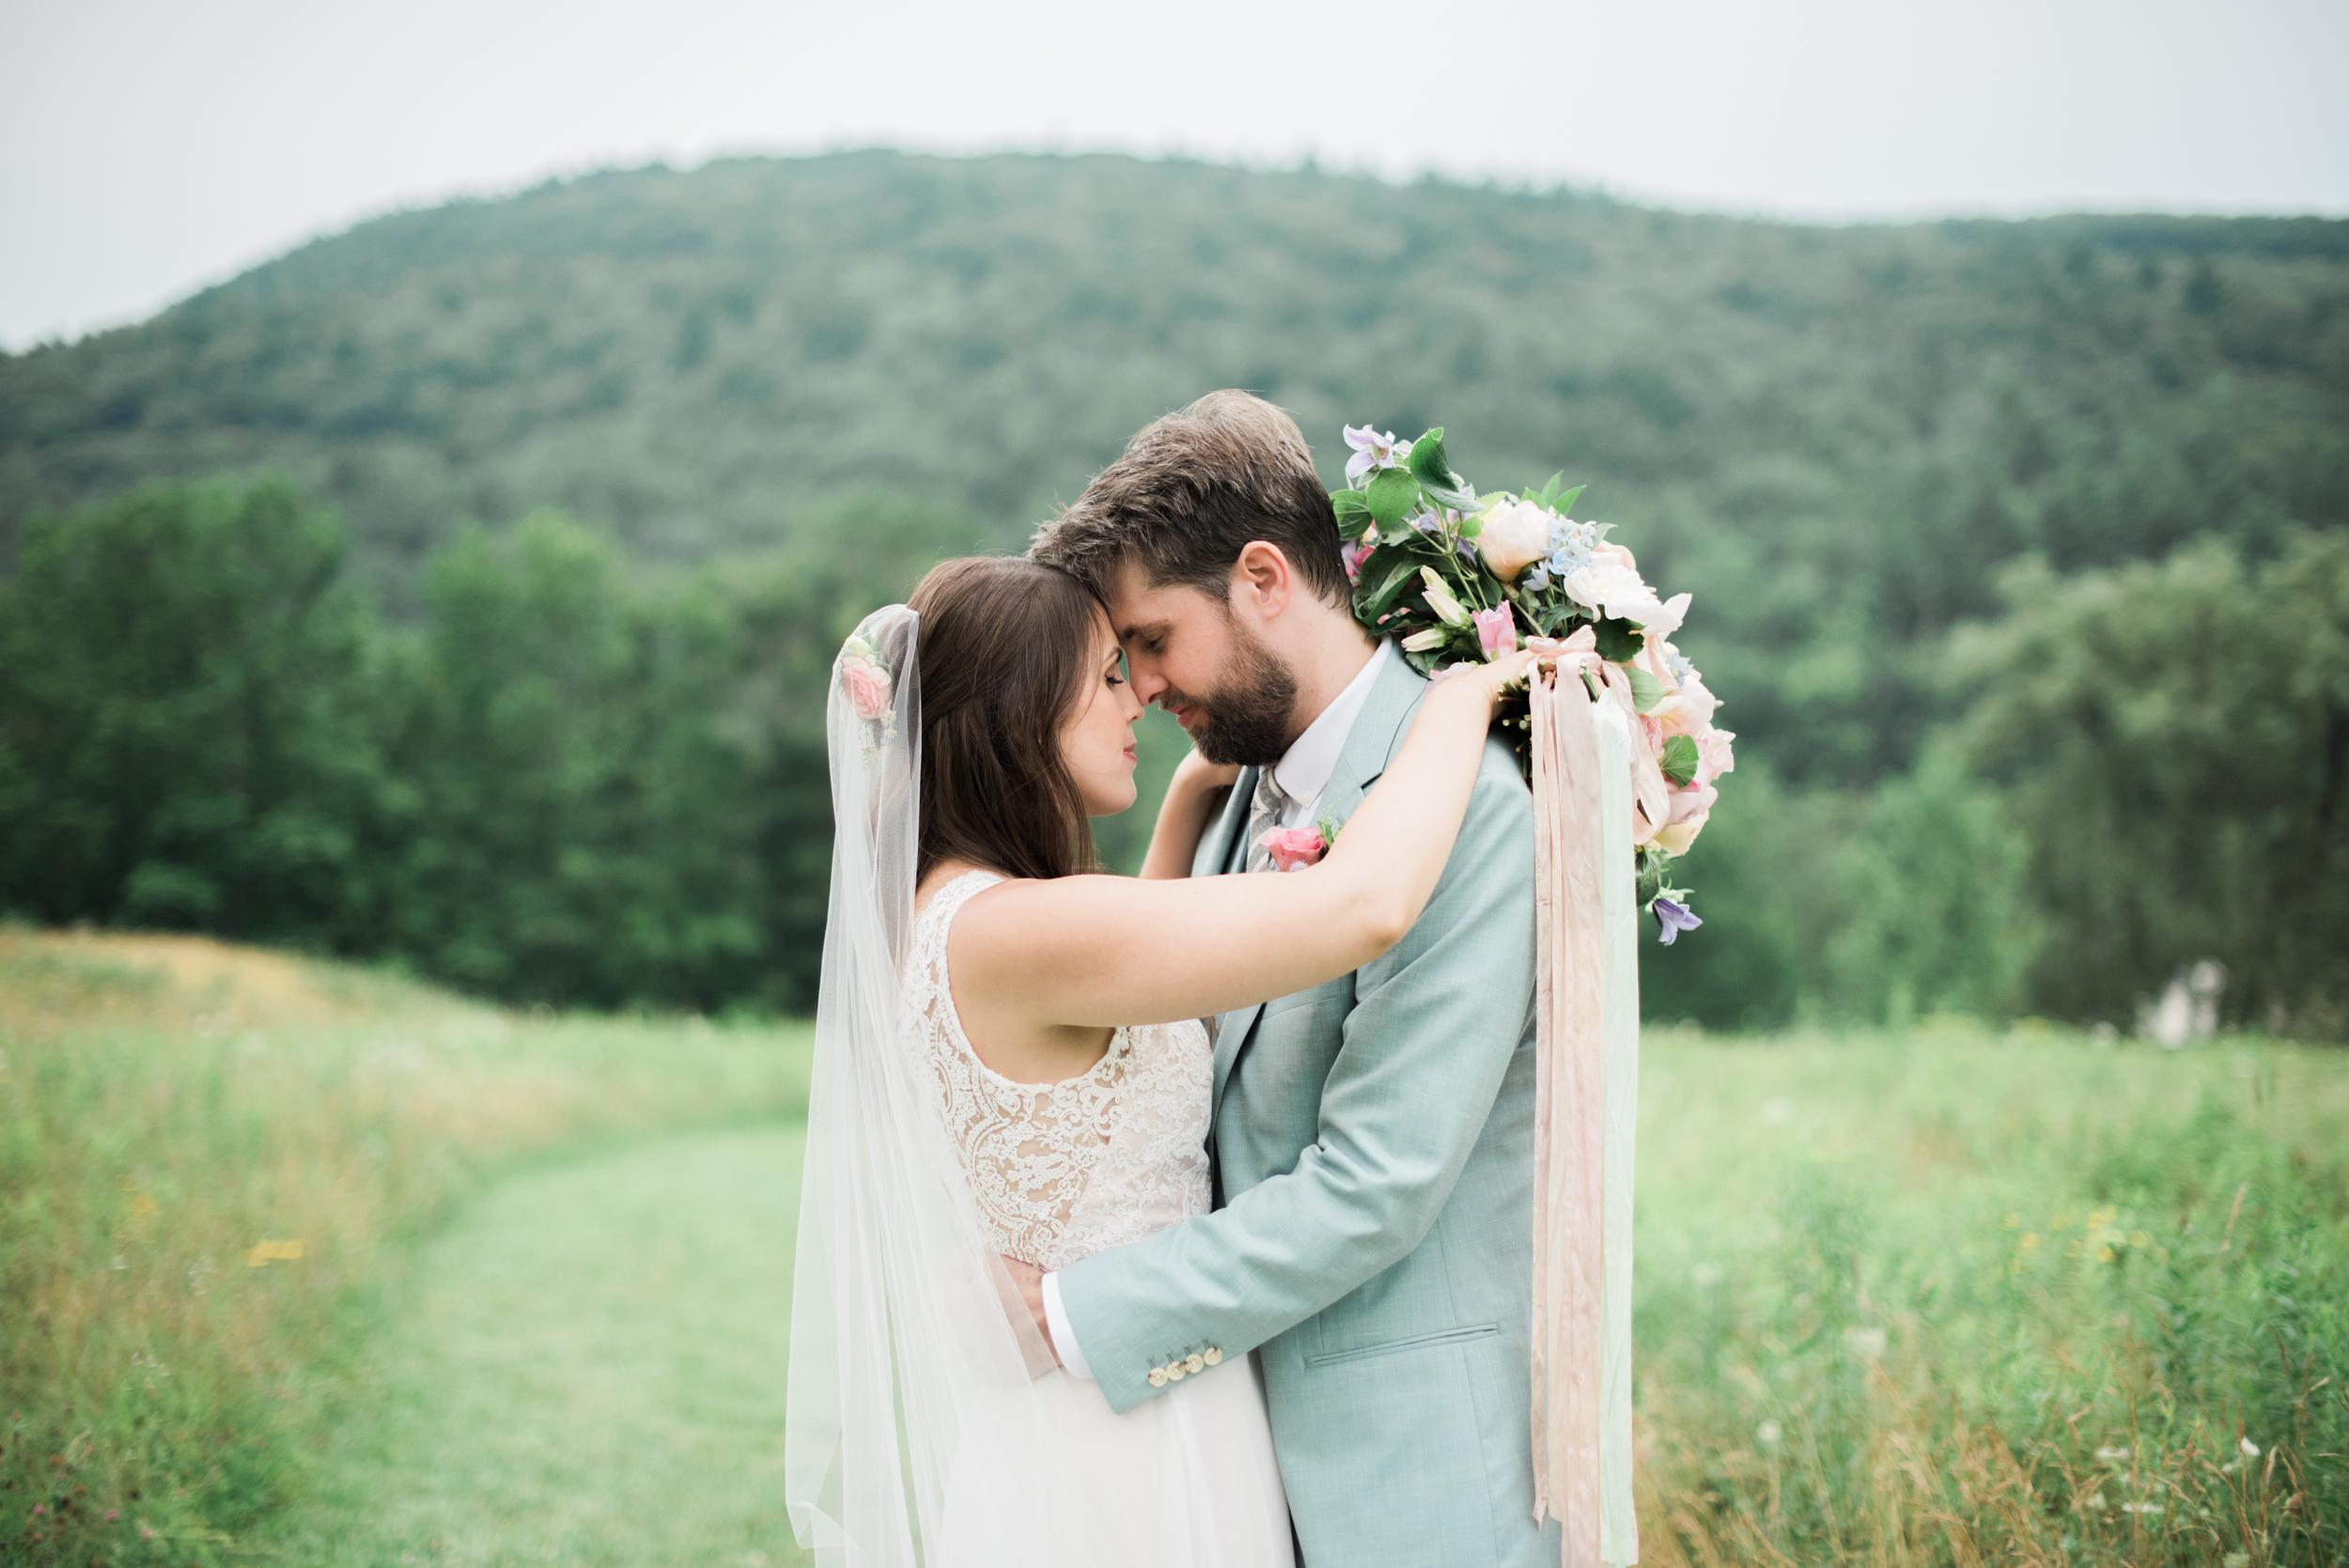 Outdoor Wedding photography in the berkshires